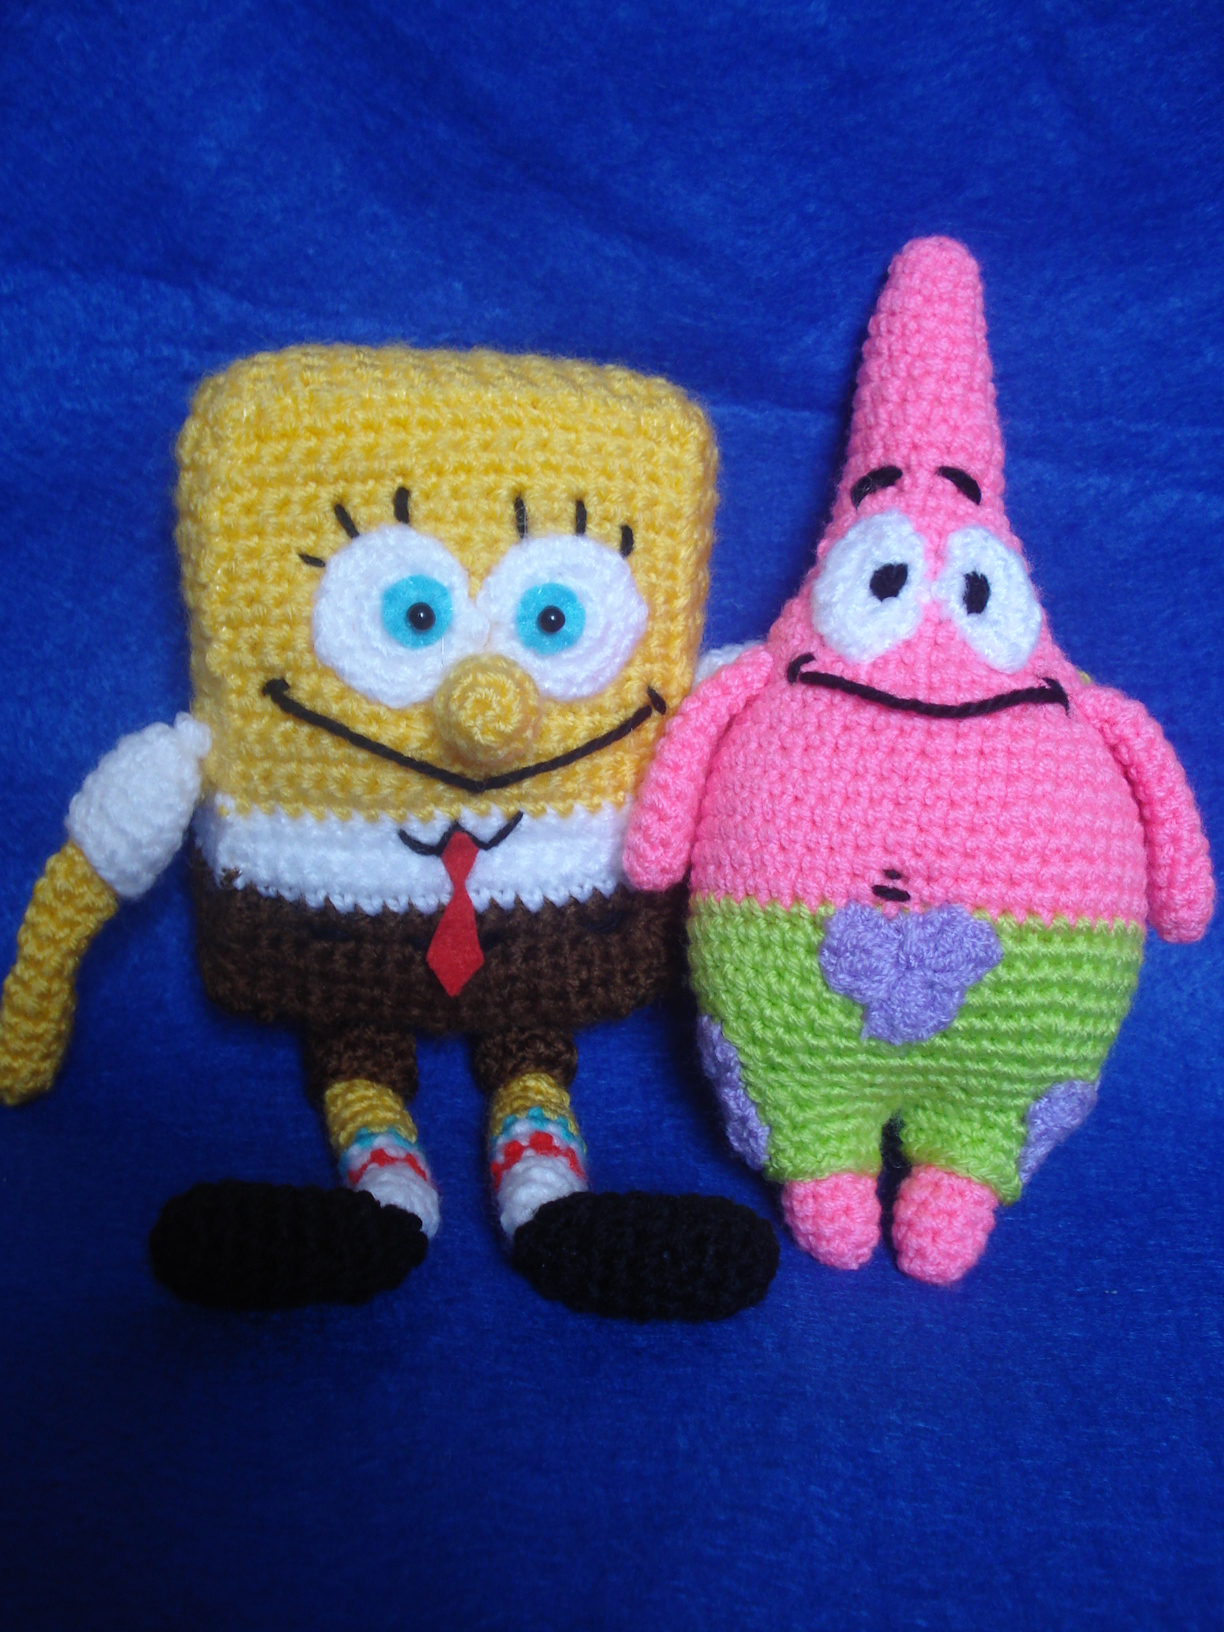 Patrick Star Amigurumi Pattern : Amigurumi SpongeBob Squarepants & Patrick Star Flickr ...